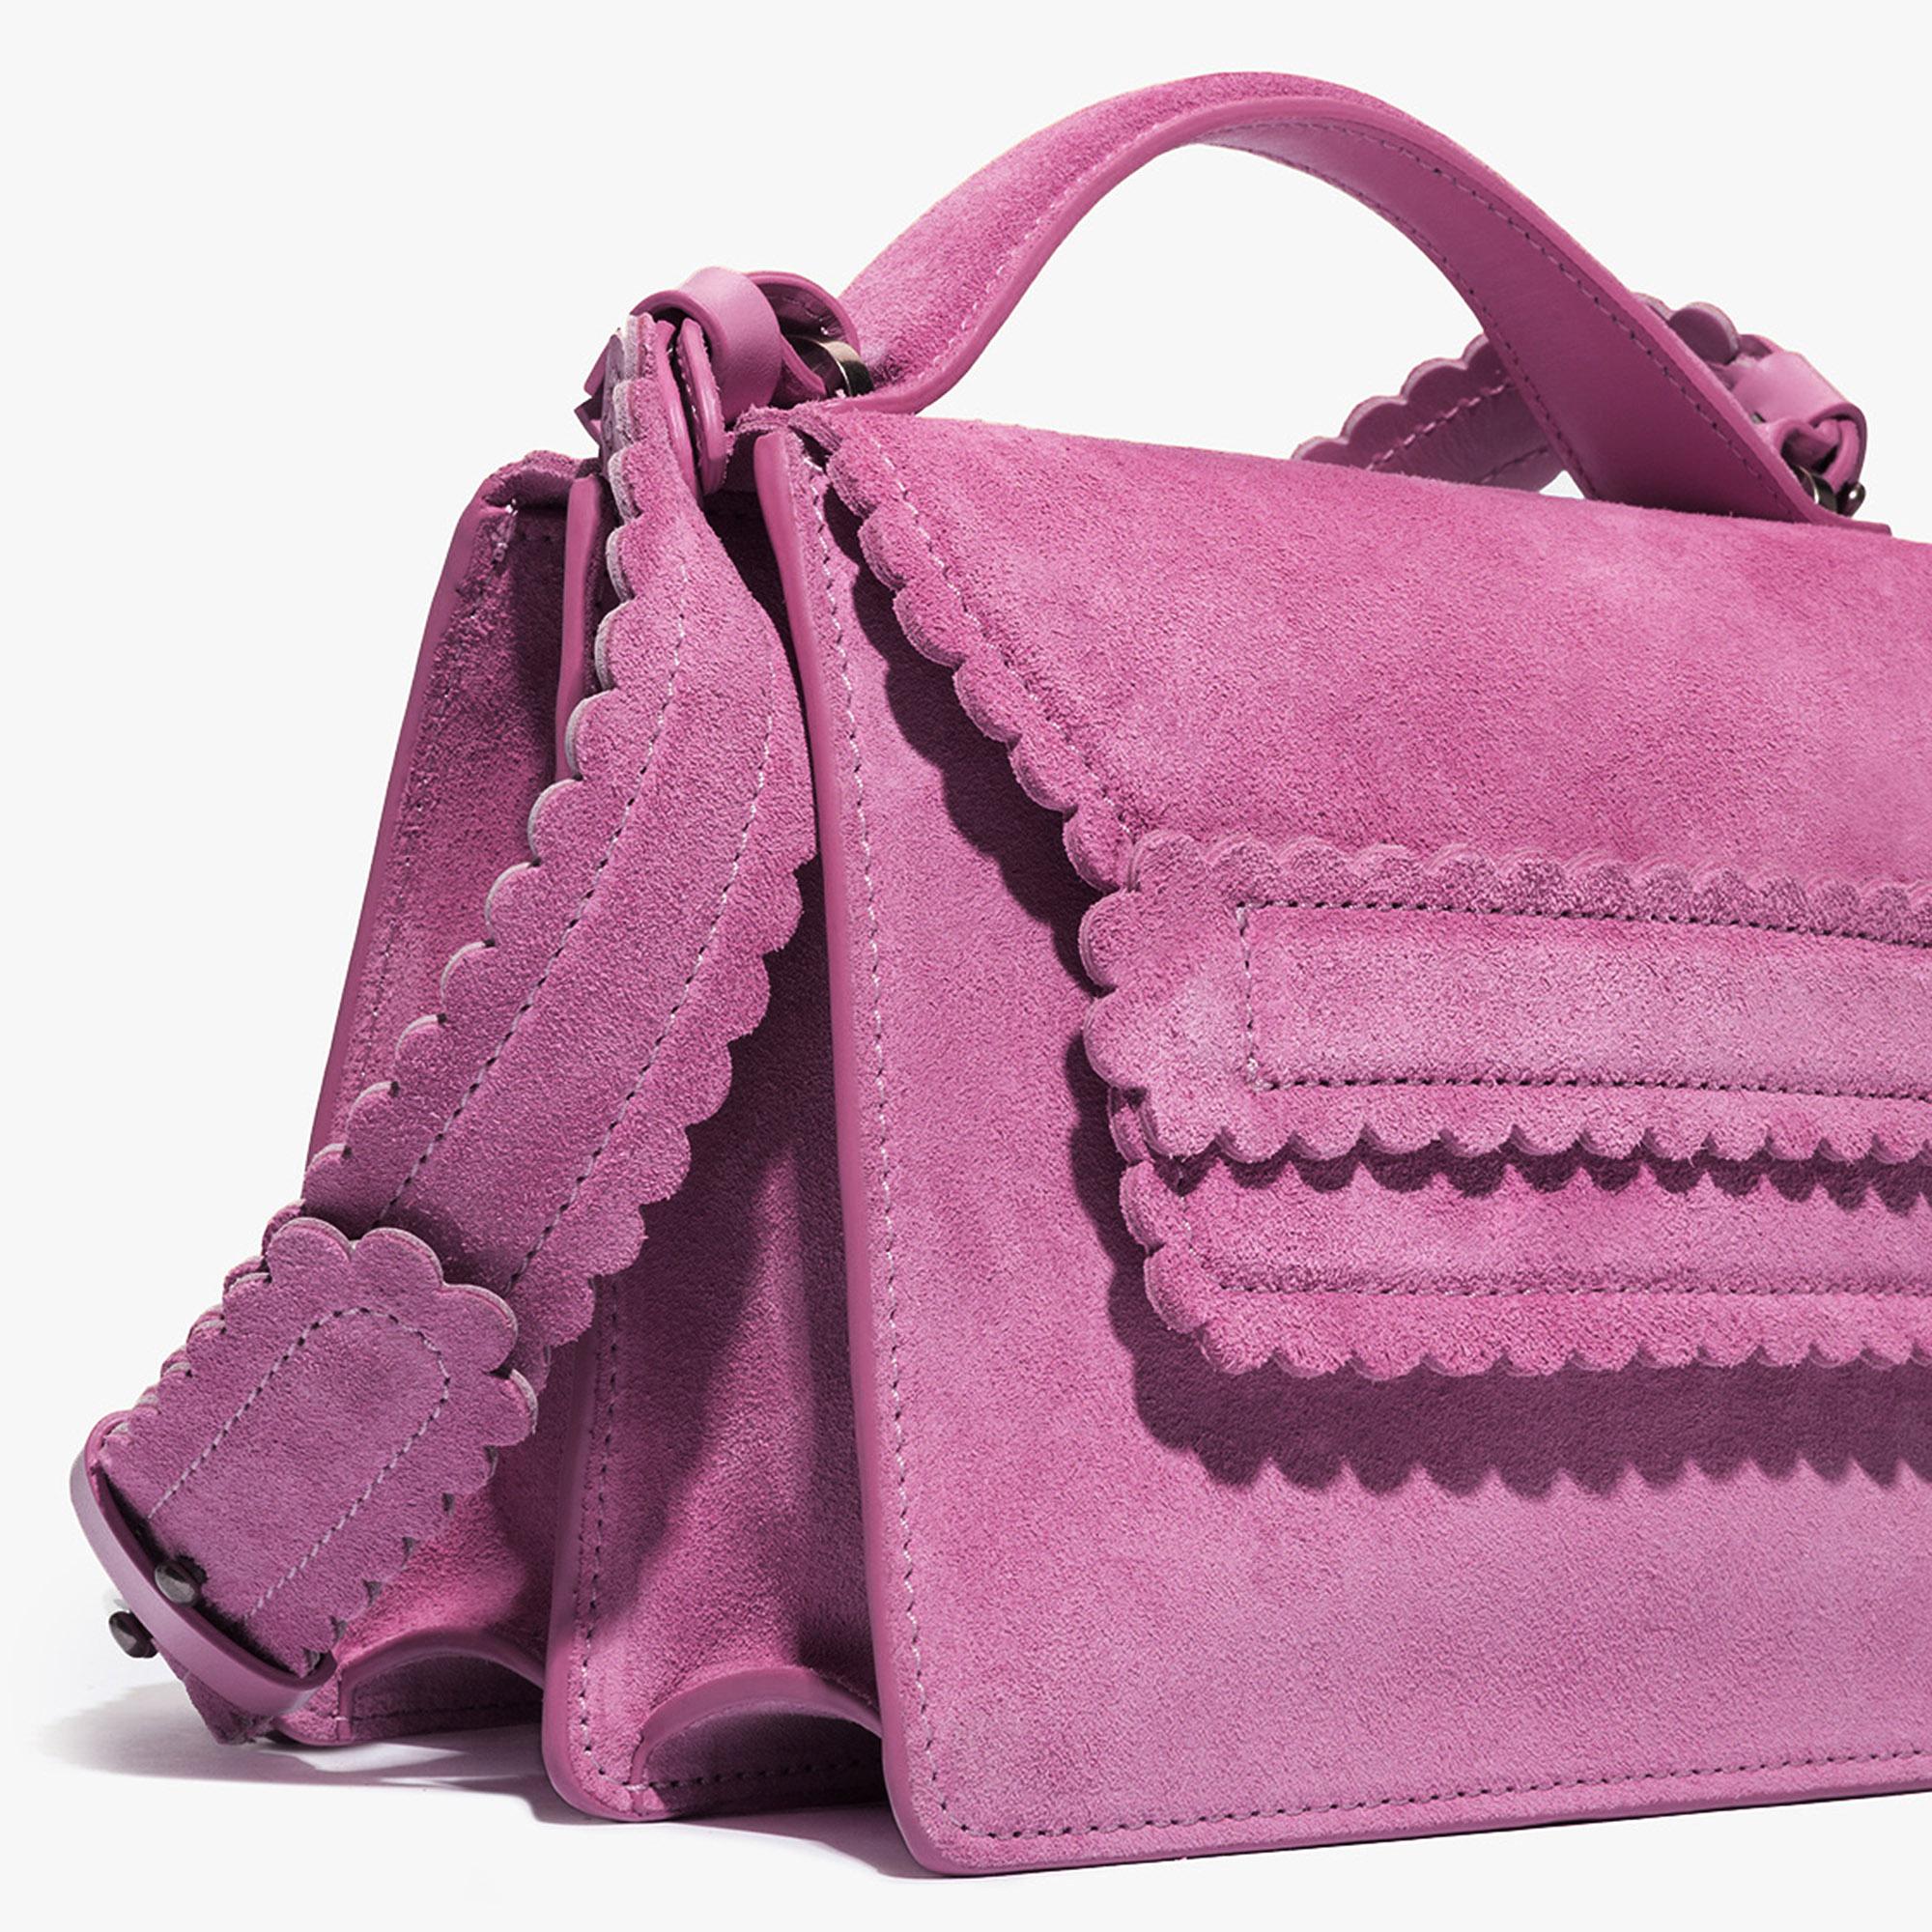 Coccinelle Leopoldine suede cross-body bag